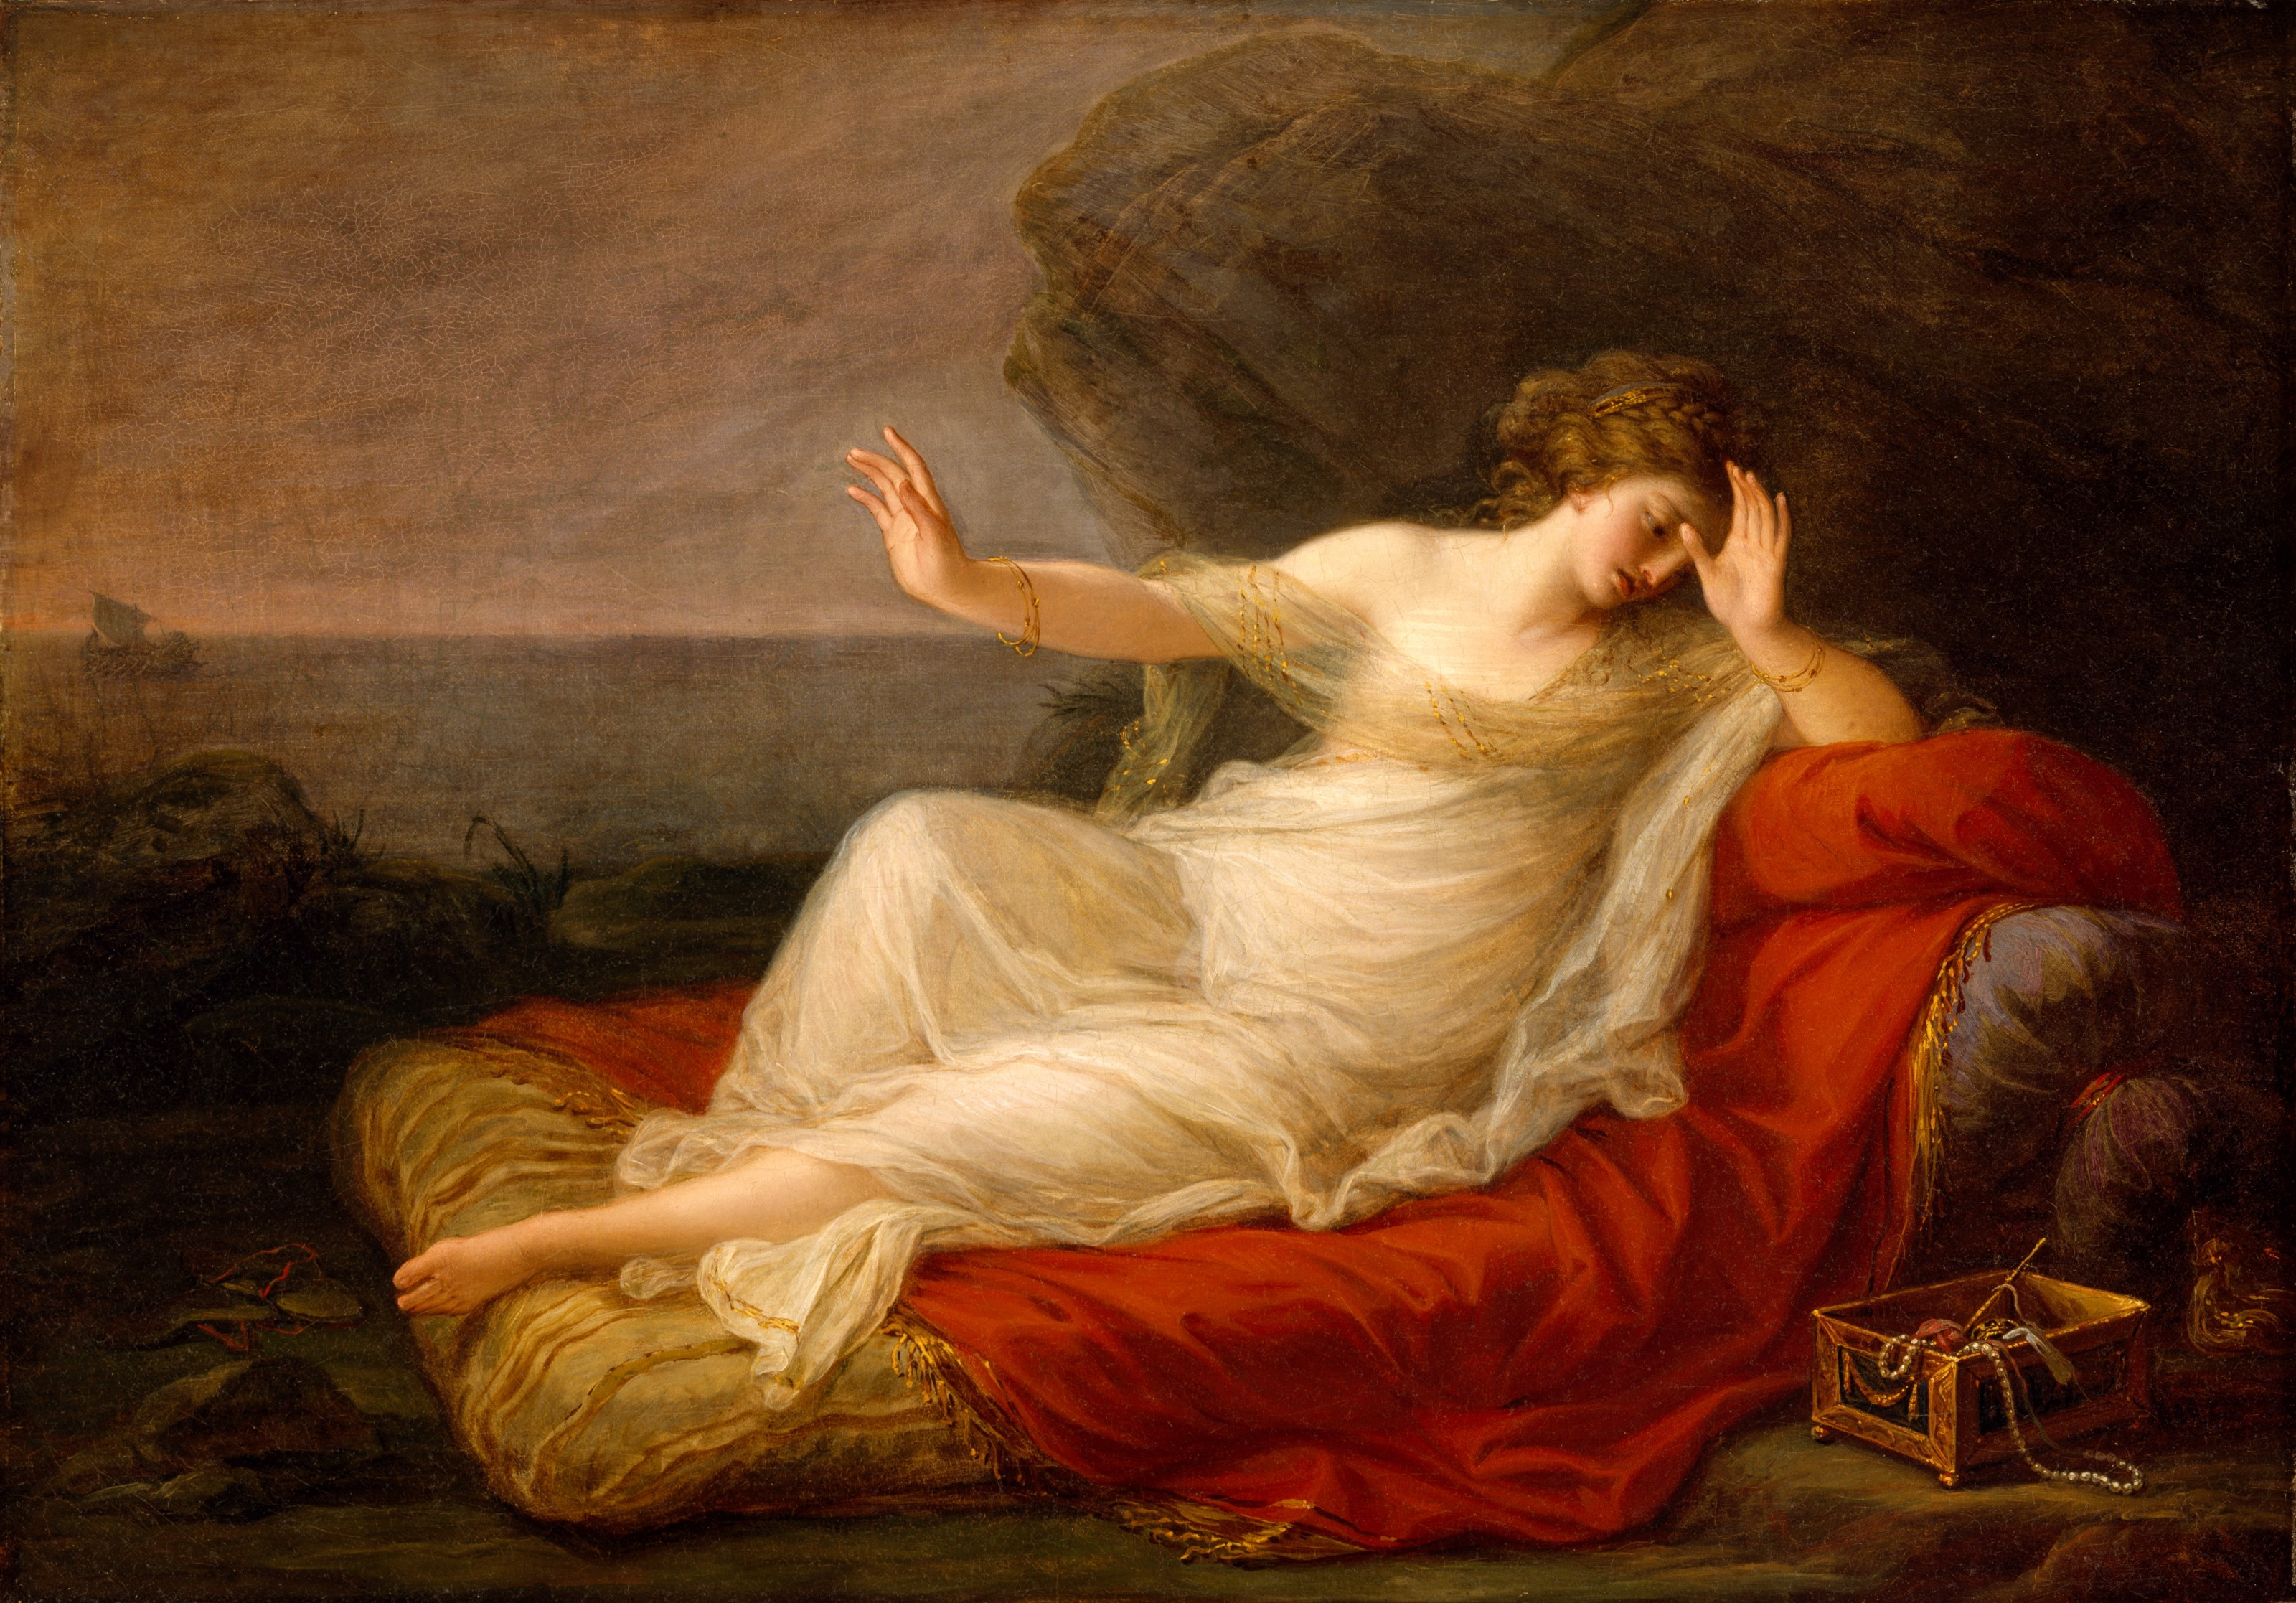 Angelica Kauffmann - Page 2 Angelica_Kauffmann,_Ariadne_Abandoned_by_Theseus,_1774